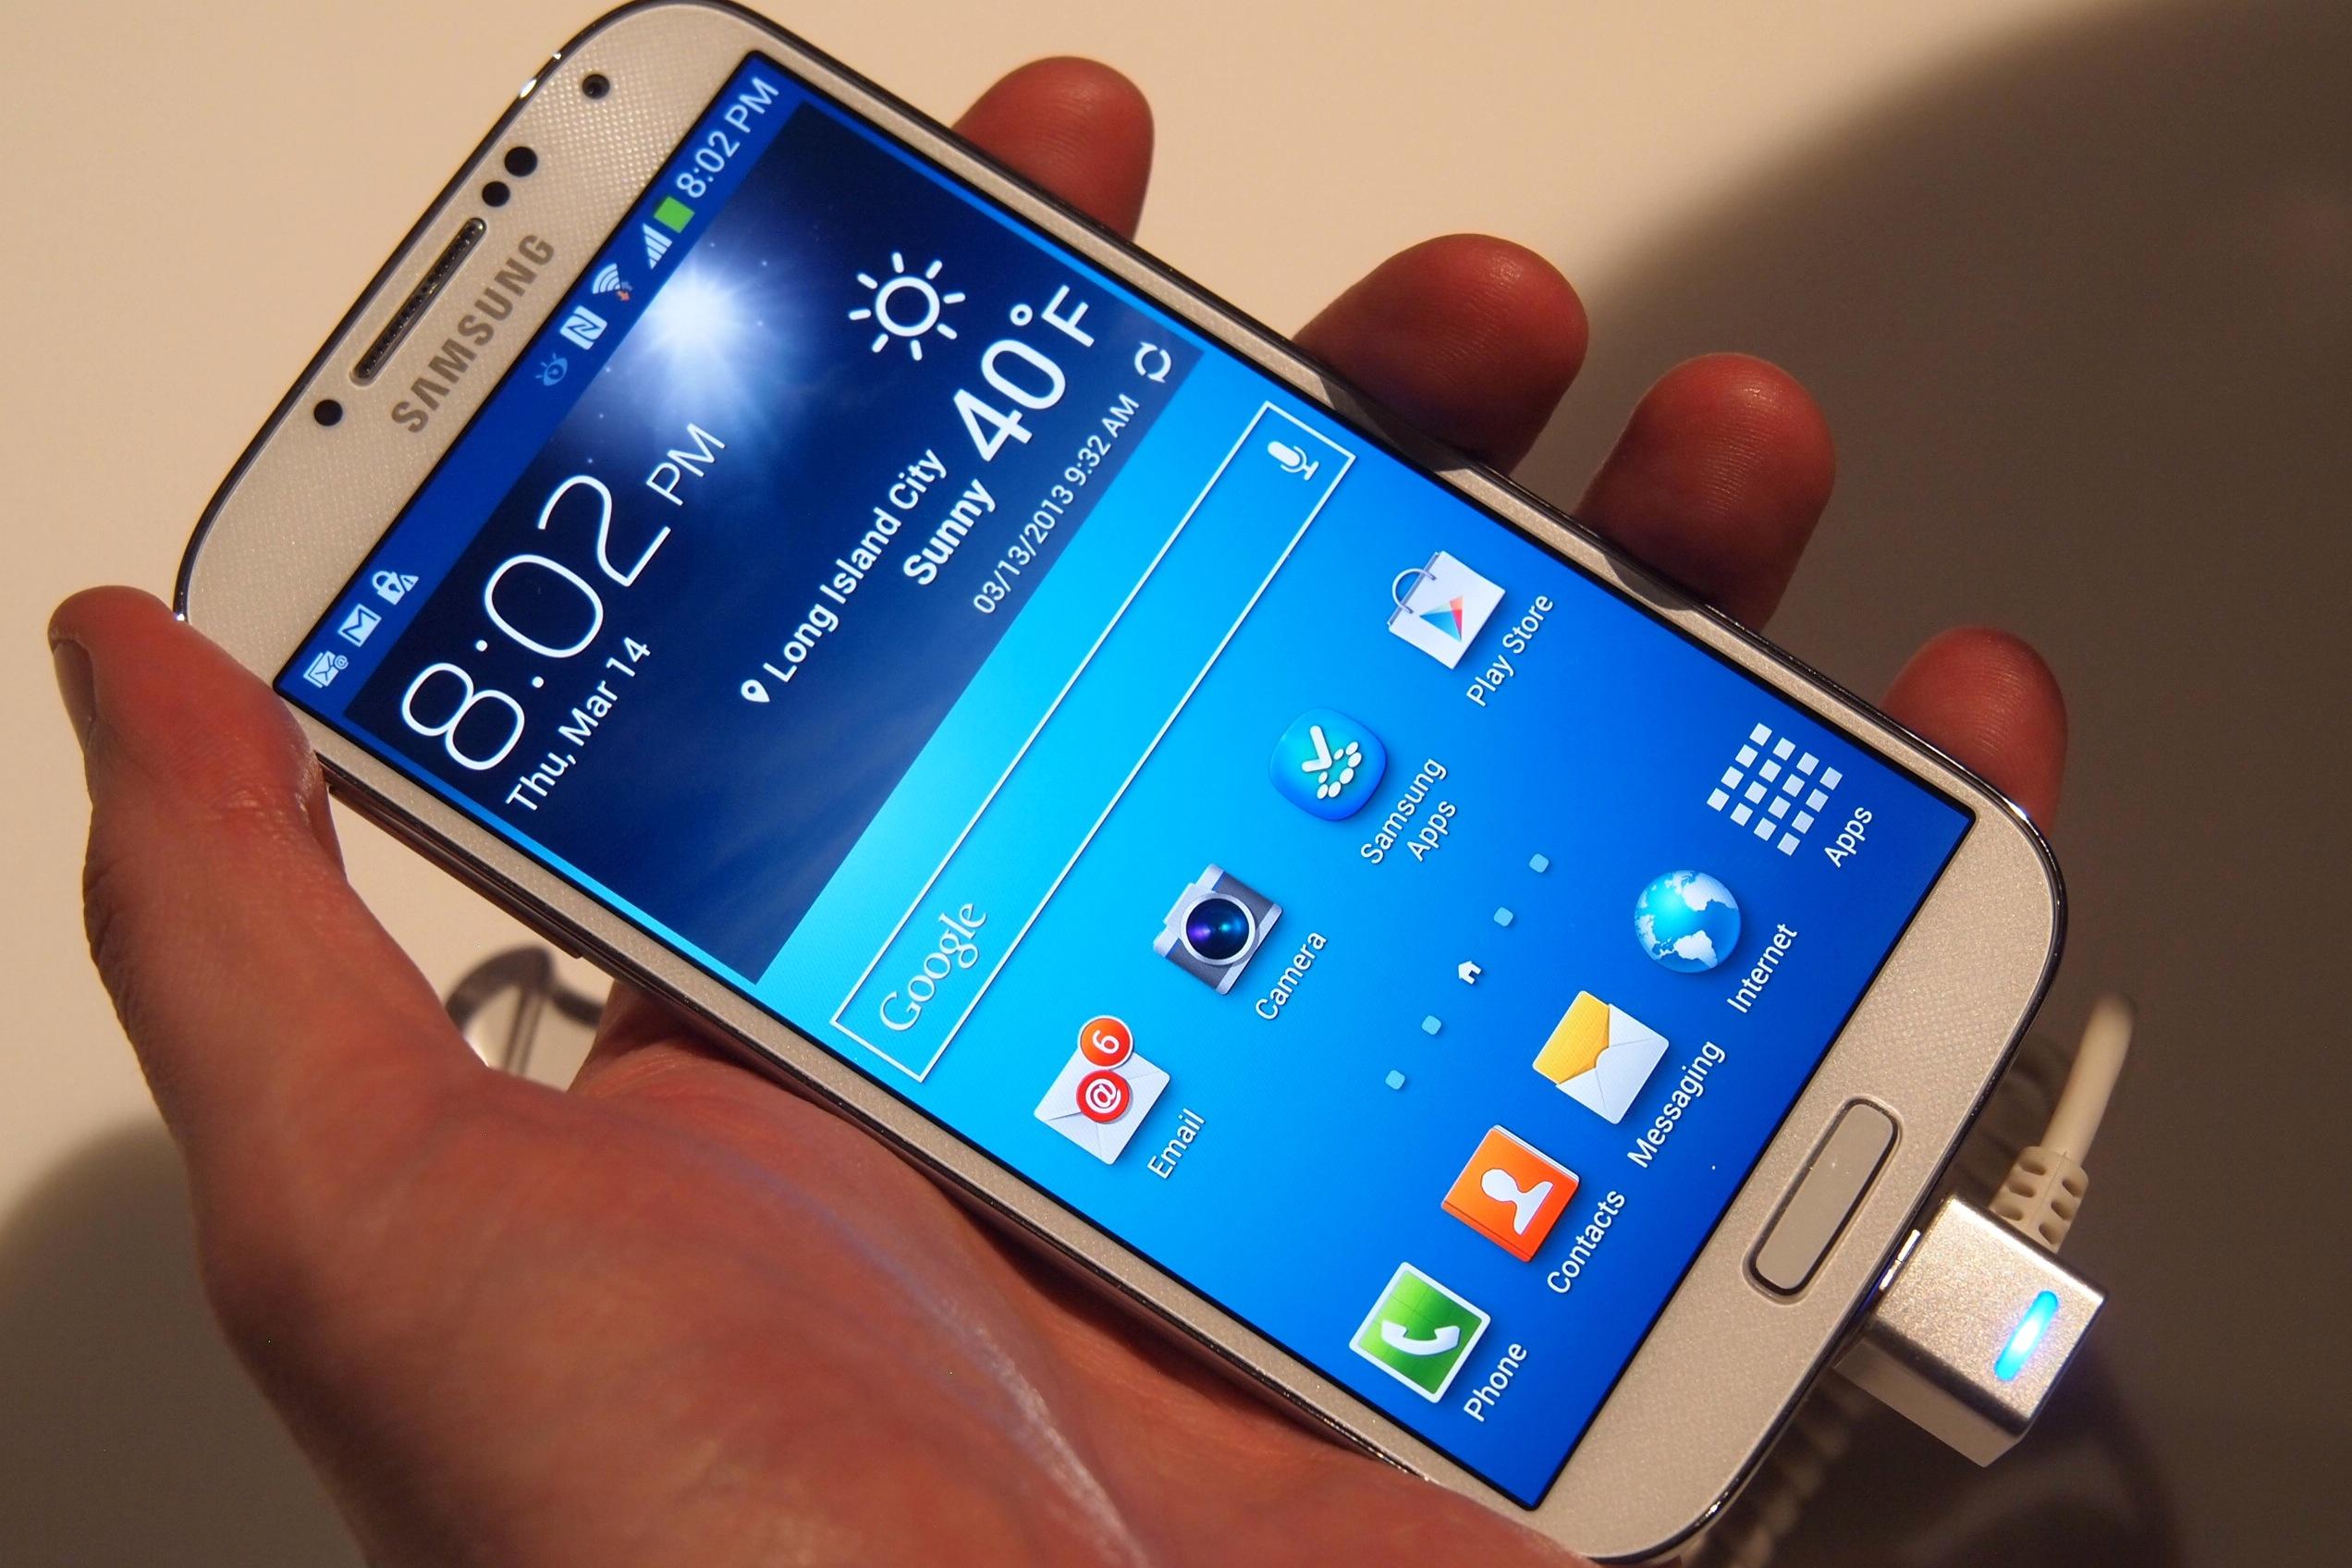 Galaxy S4 da 2.3 GHz